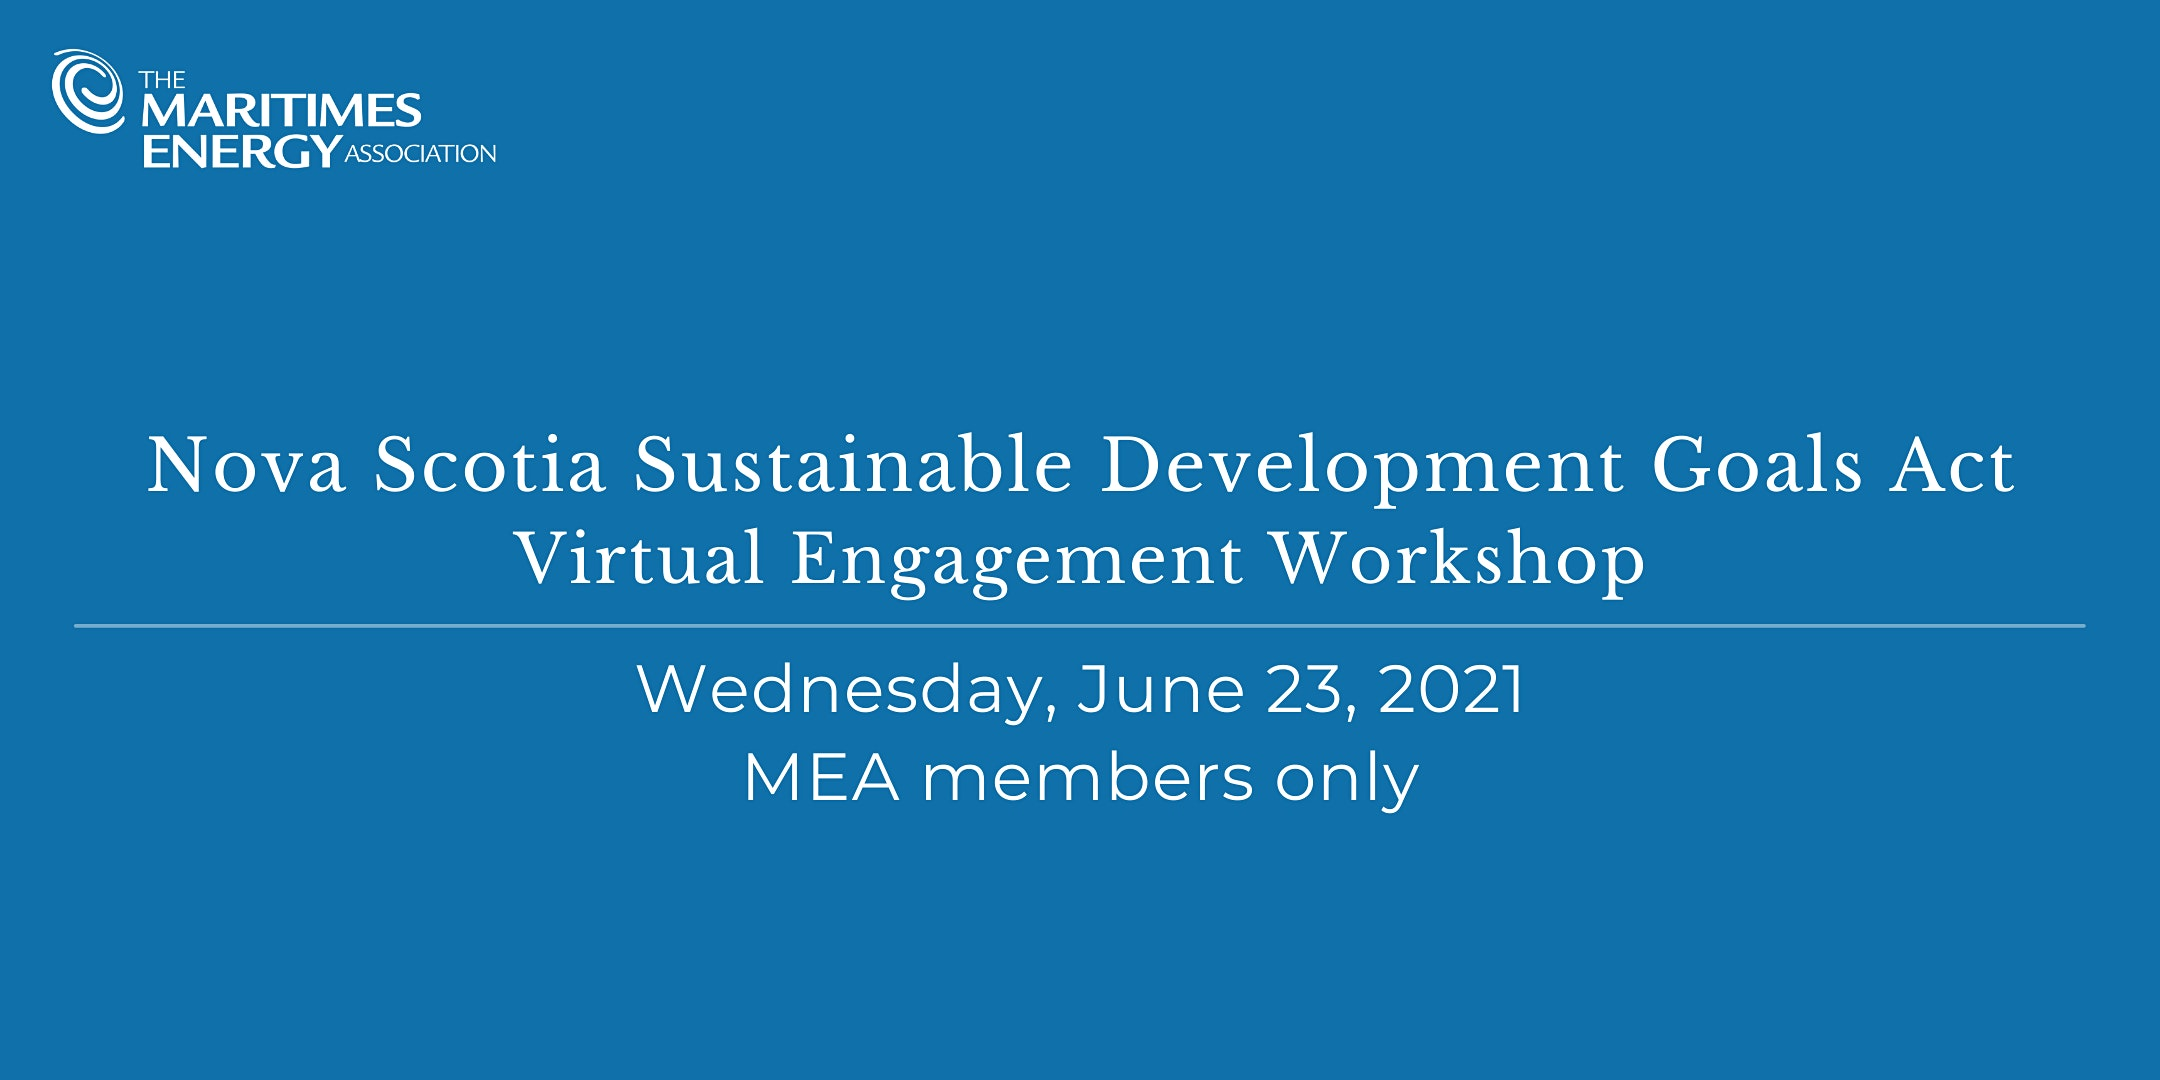 MEA Sustainable Development Goals Act Workshop